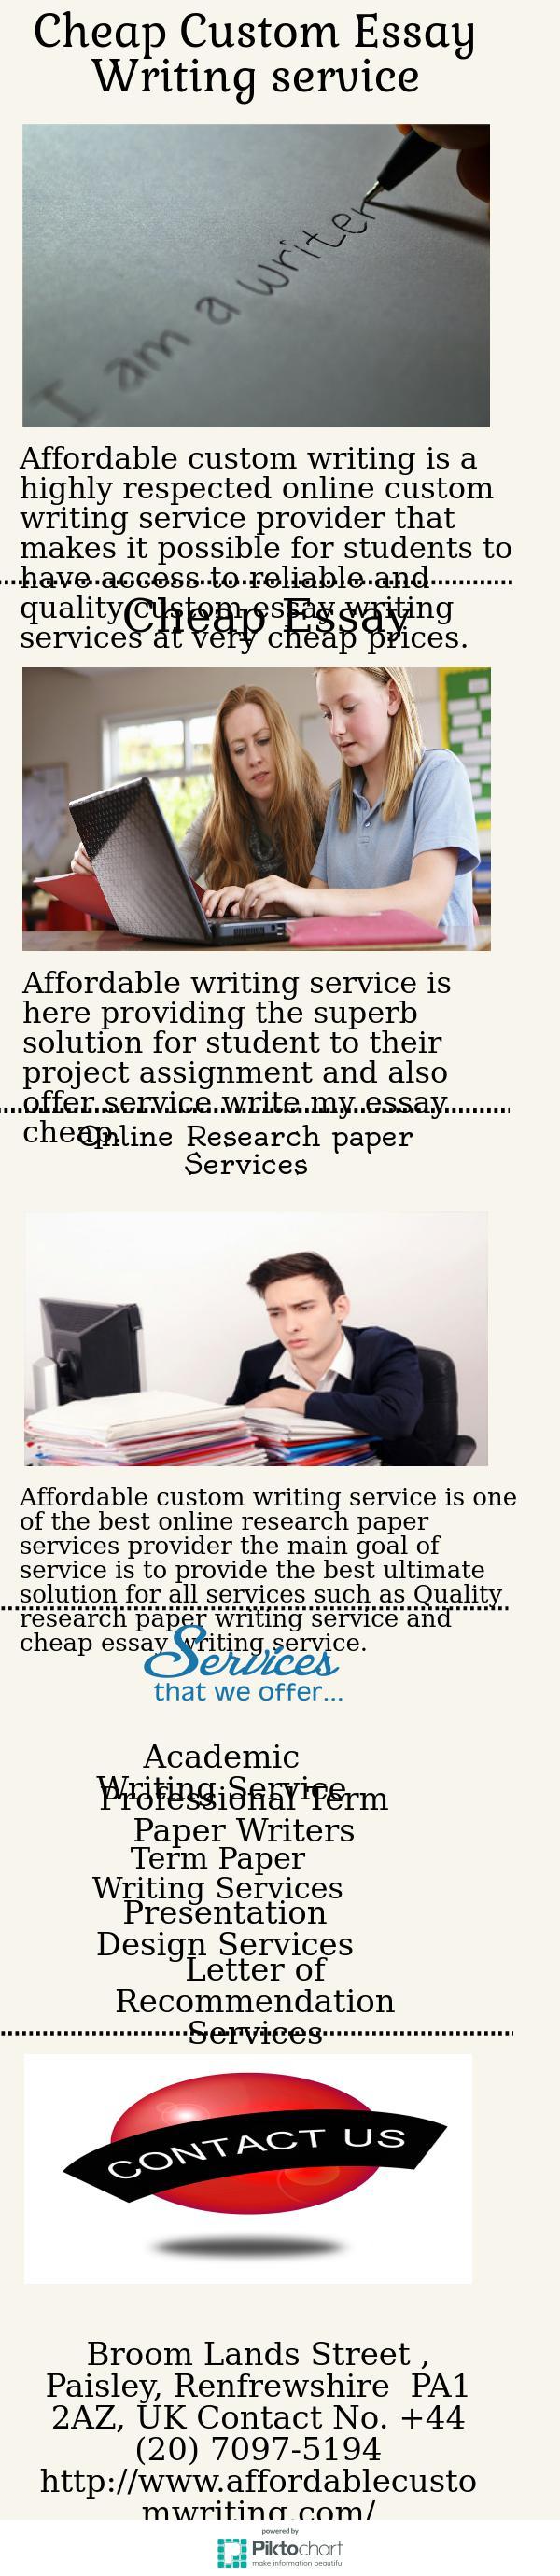 best custom essay writing services